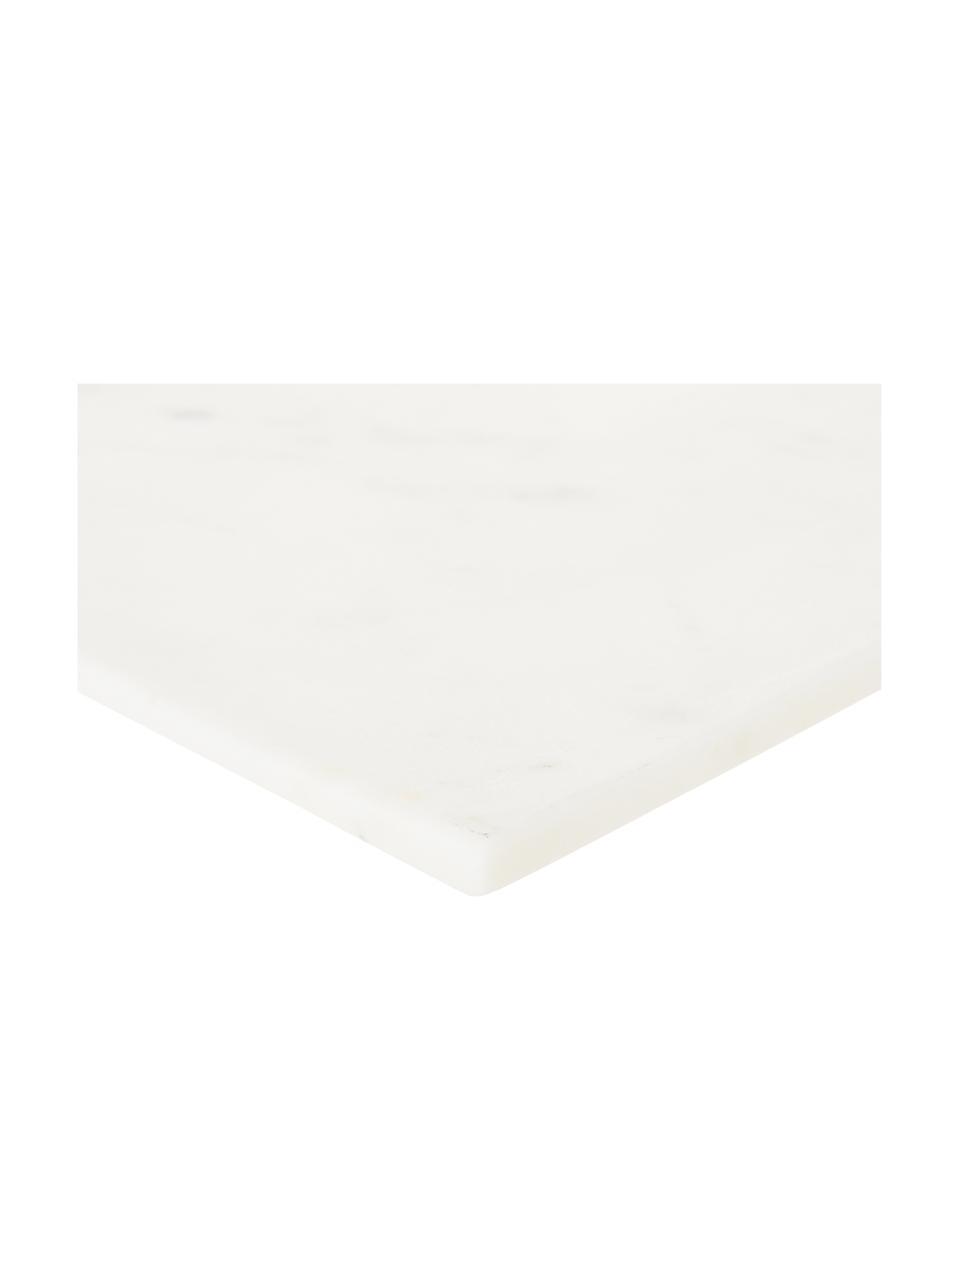 Marmeren serveerplateau Klevina, Marmer, Wit, 28 x 2 cm